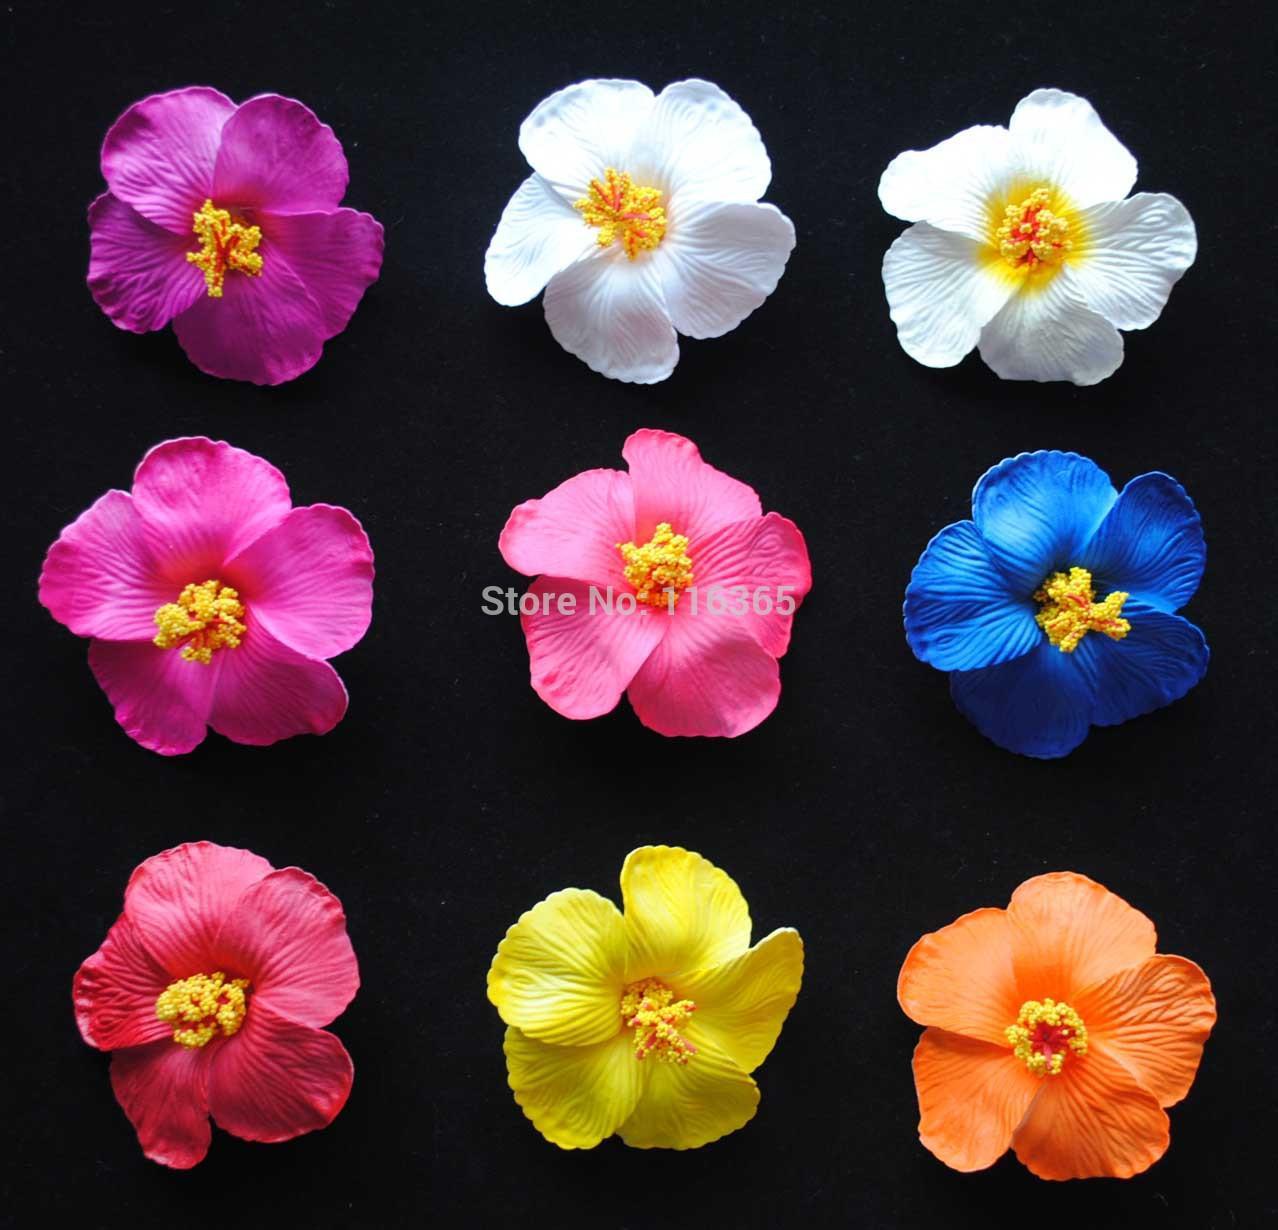 2018 wholesale on sale 9cm hibiscus foam flower hawaiian hair 2018 wholesale on sale 9cm hibiscus foam flower hawaiian hair flower clip decorative wedding party flower from goodwork 2586 dhgate izmirmasajfo